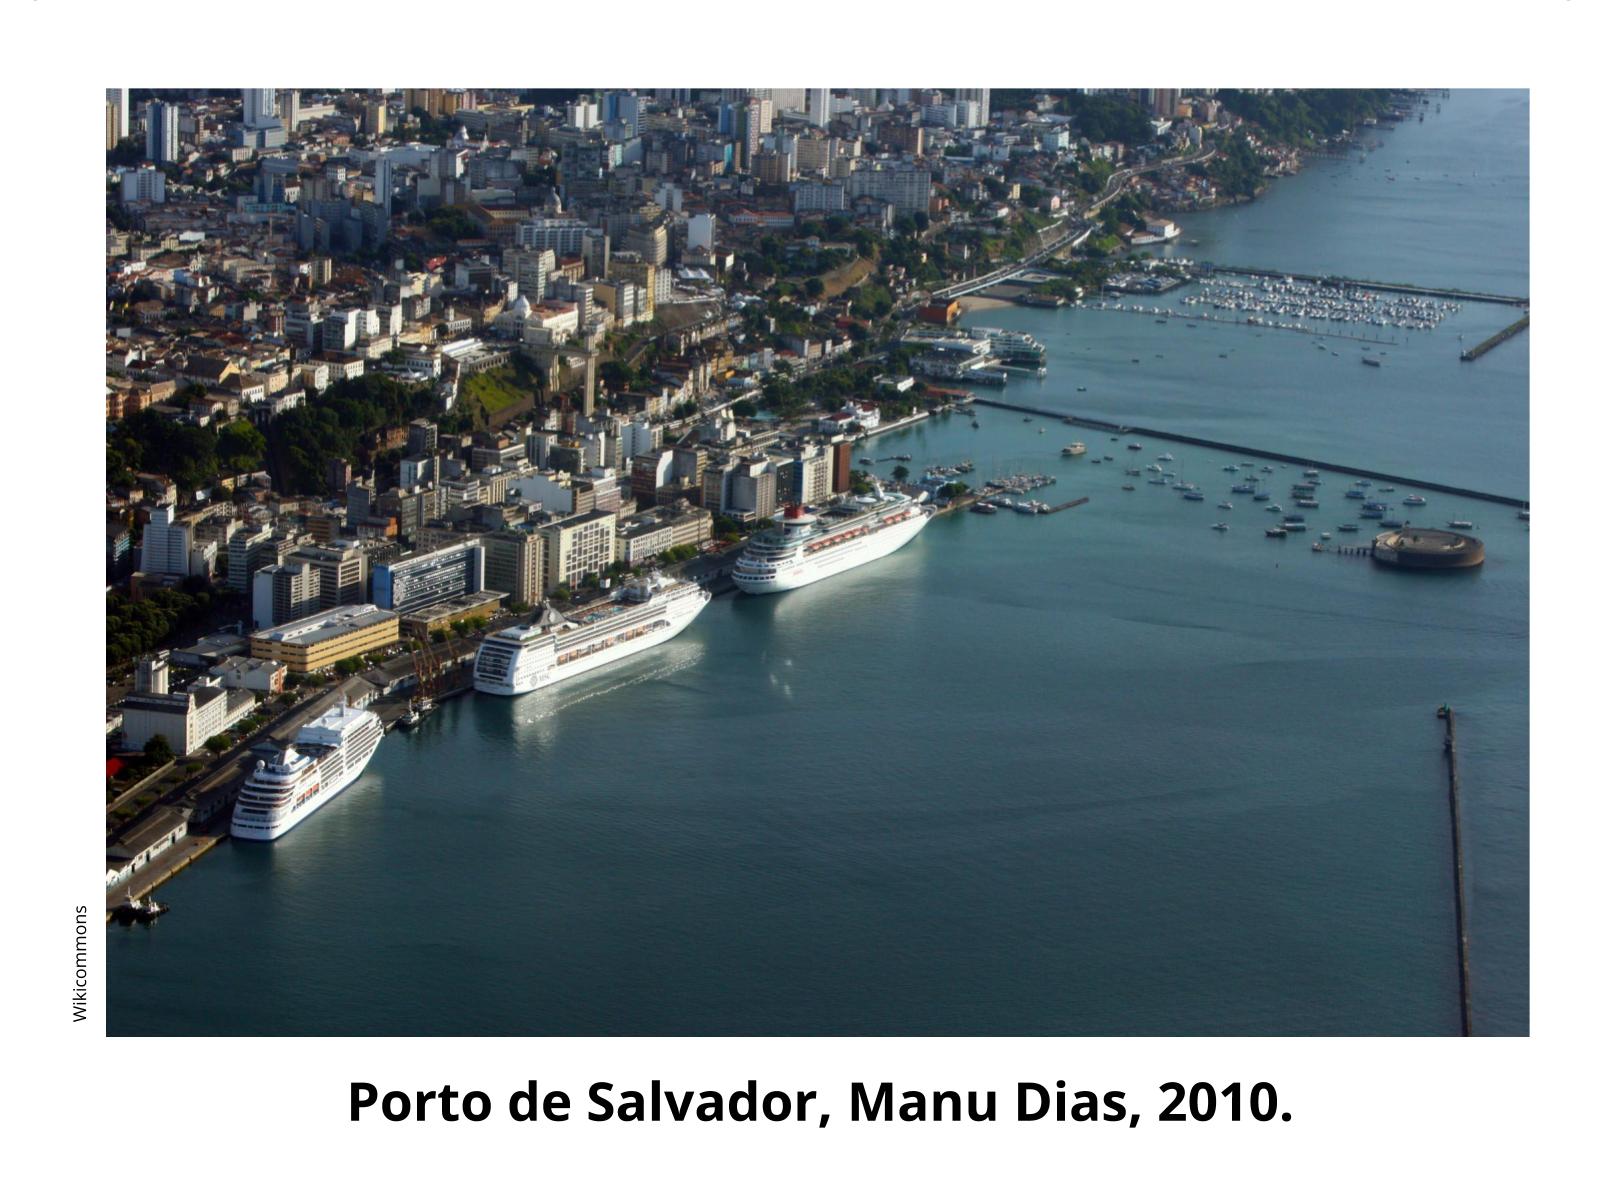 Os portos de desembarque  dos escravizados no Brasil